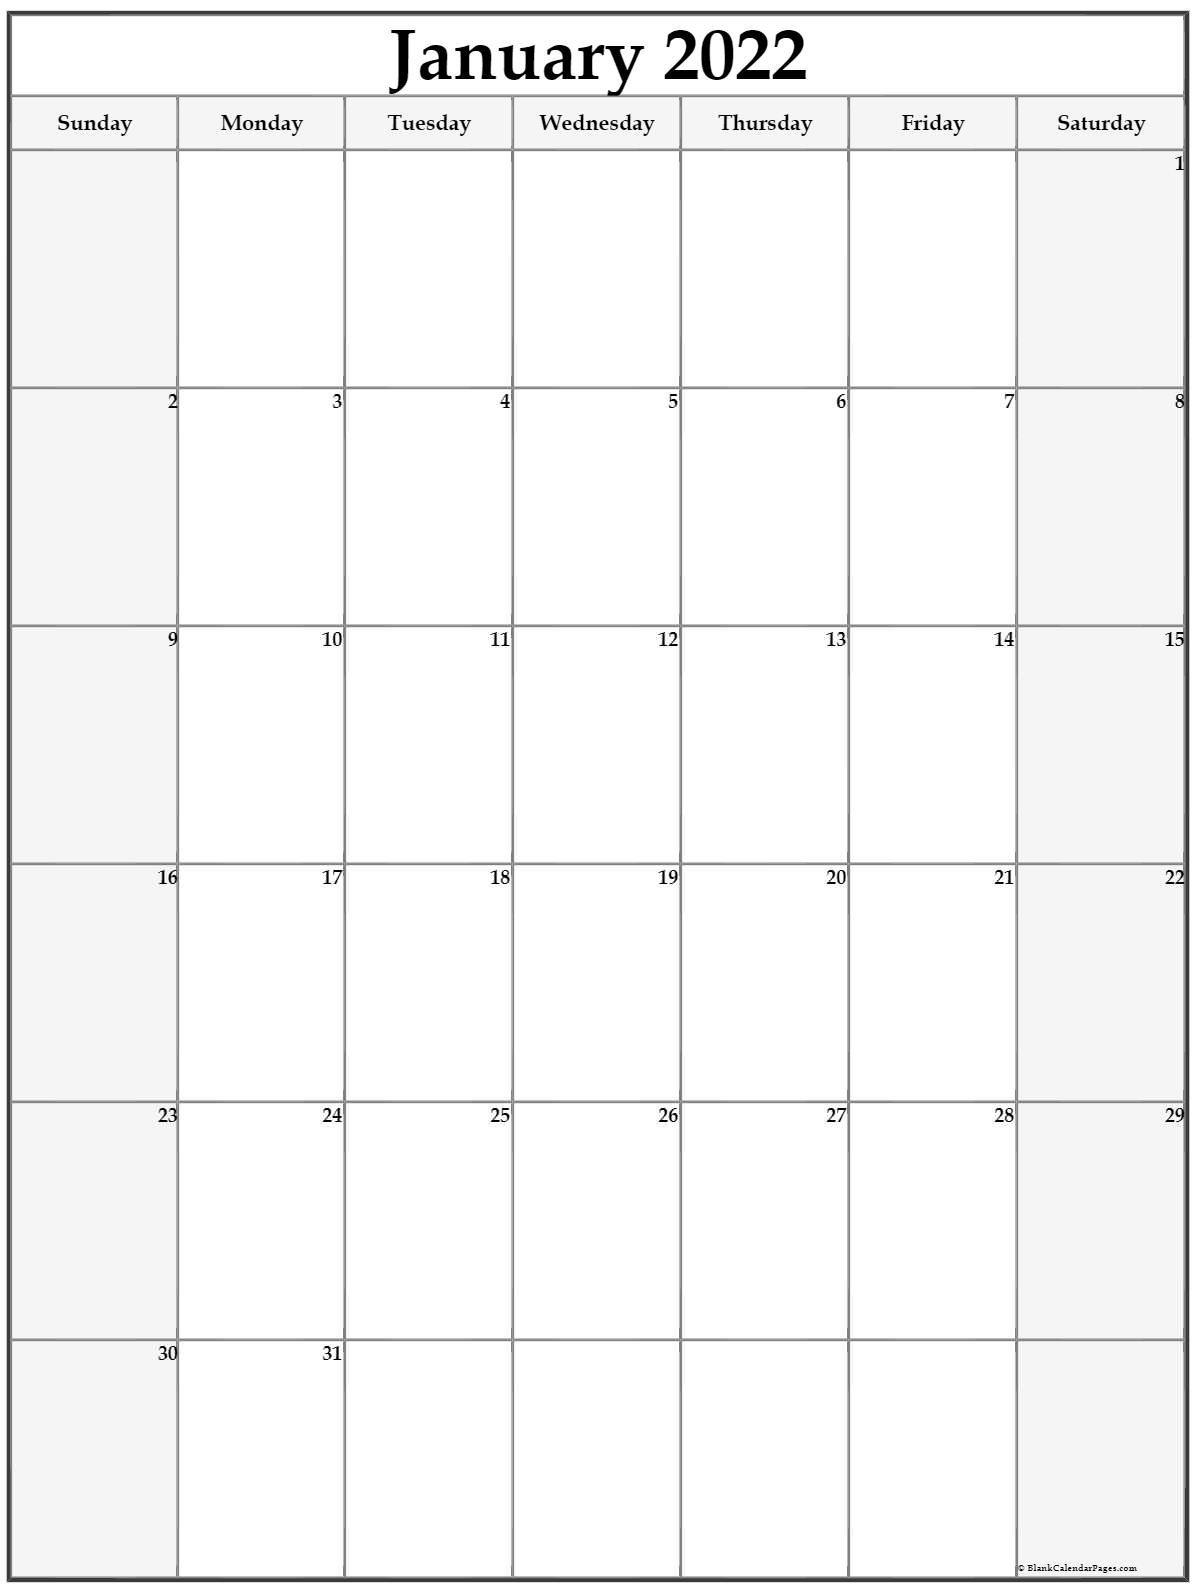 January 2022 Vertical Calendar   Portrait regarding January 2022 Calendar Printable Free Graphics